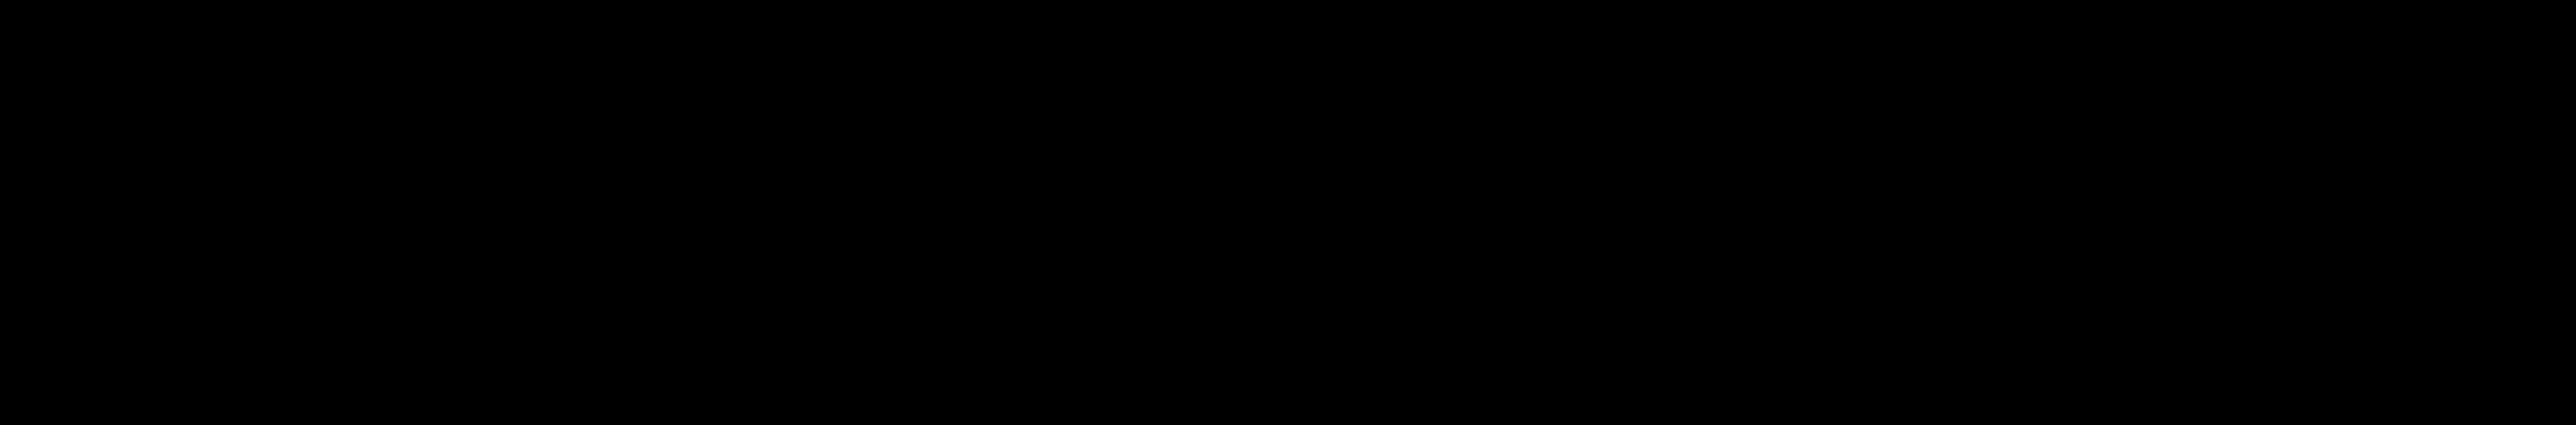 UH02 Hollow METRO Decking board profile drawing